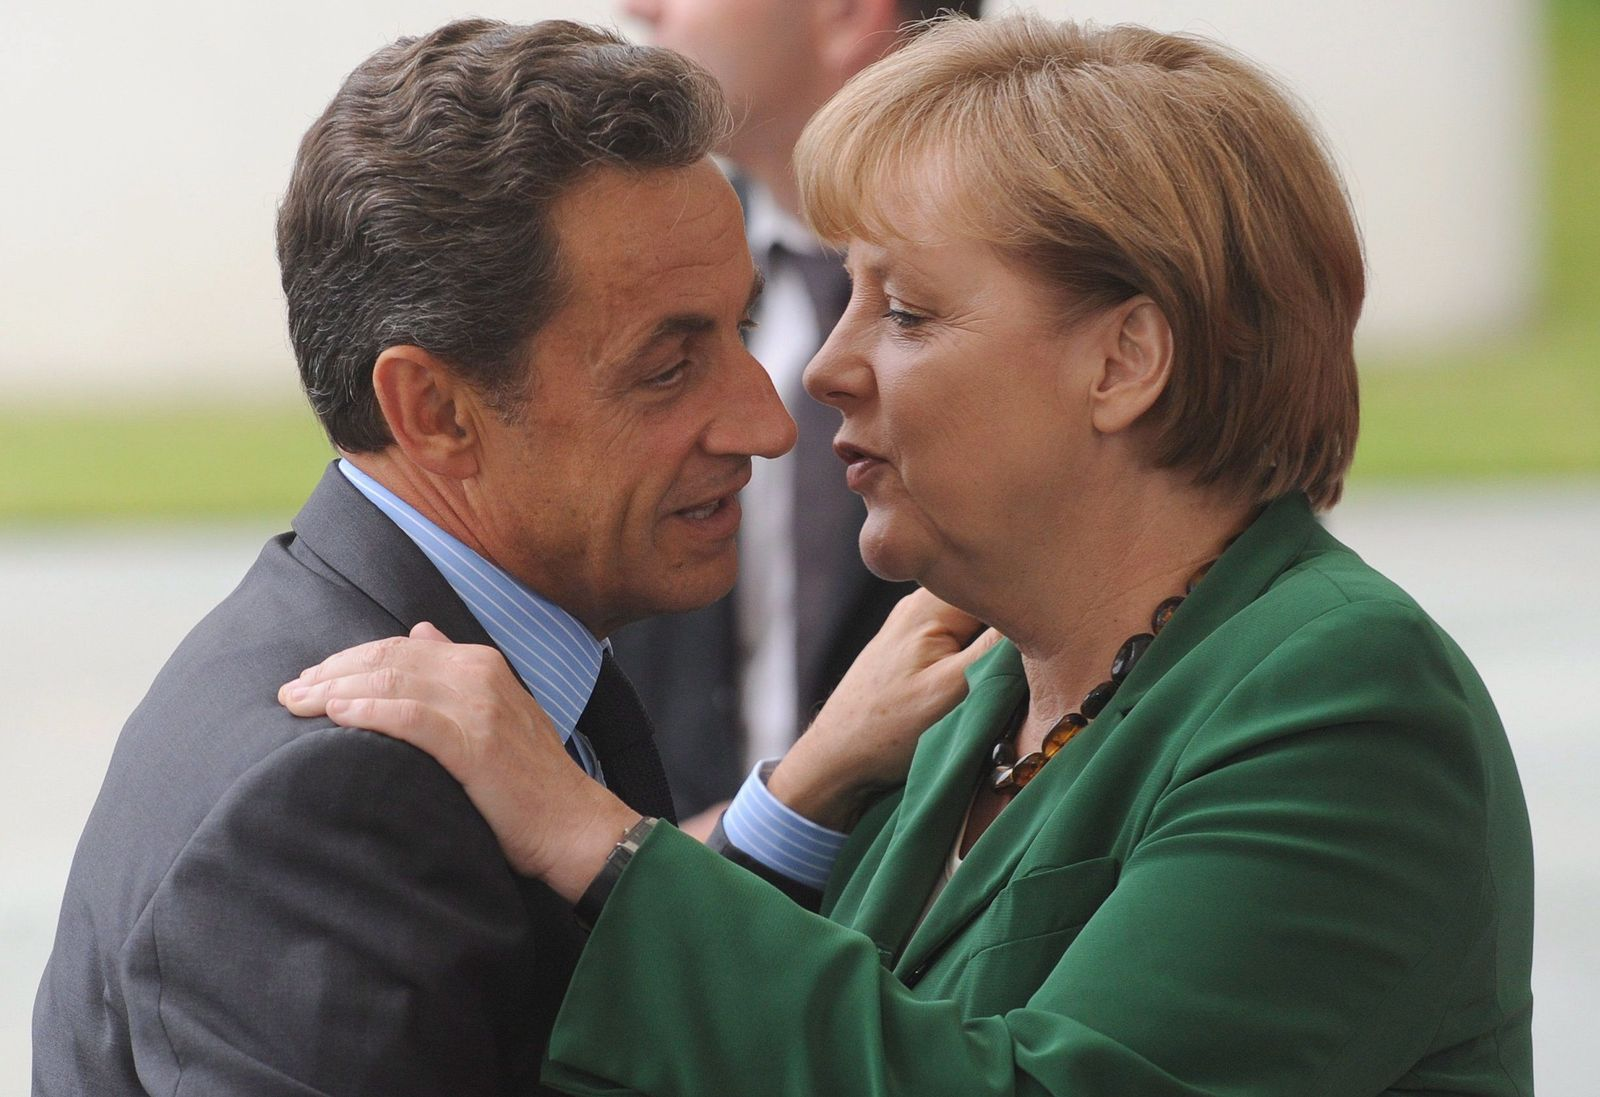 Angela Merkel/ Nicolas Sarkozy XXL